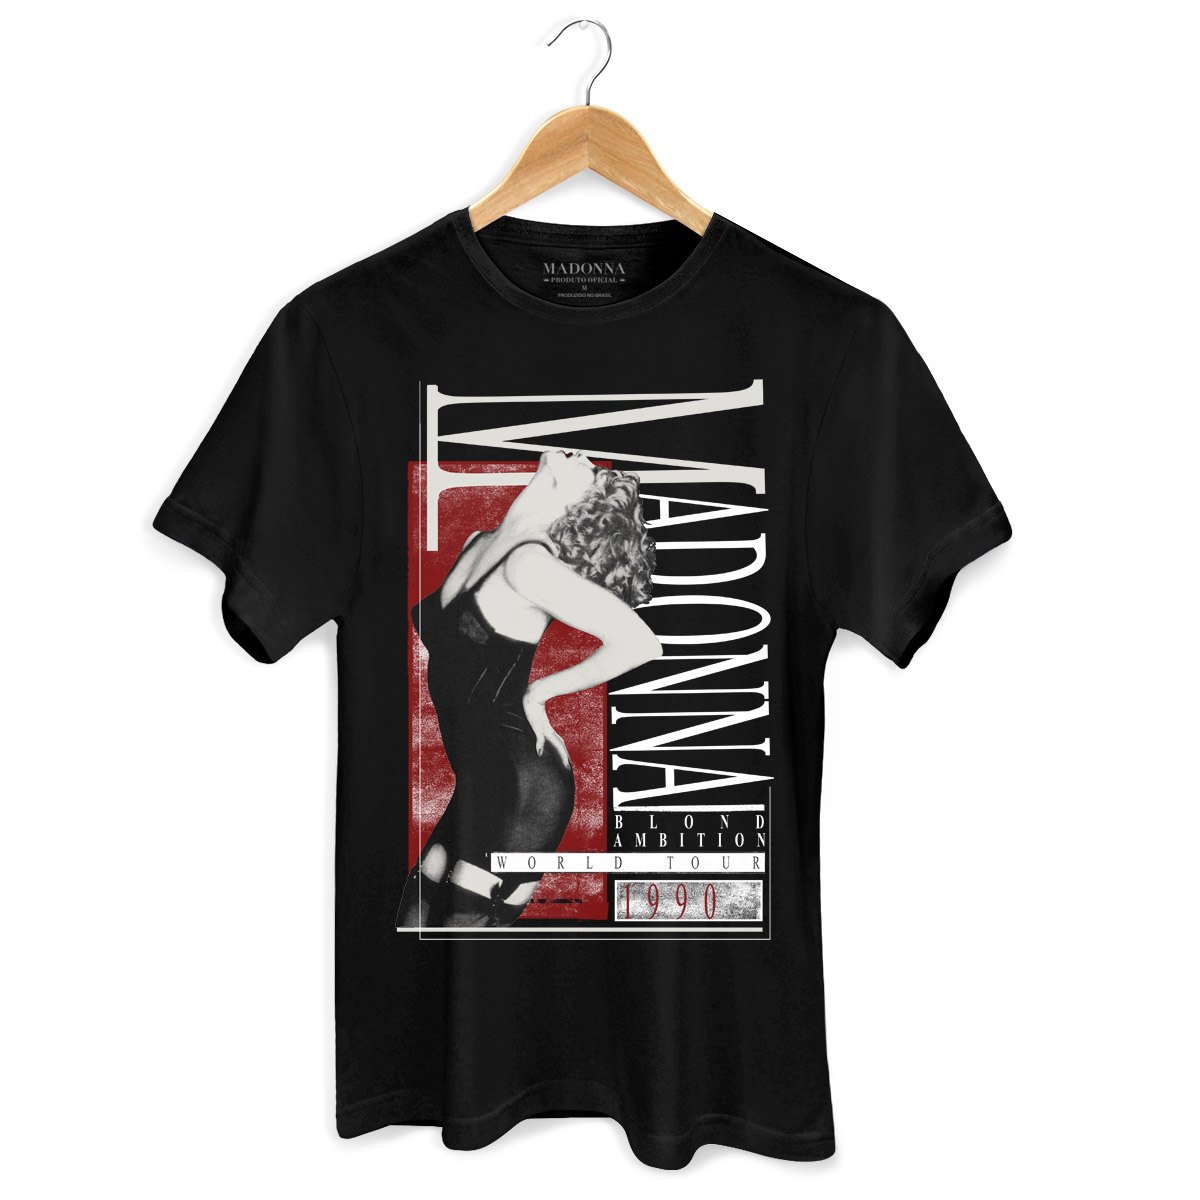 Camiseta Masculina Madonna Blond Ambition 3  - bandUP Store Marketplace